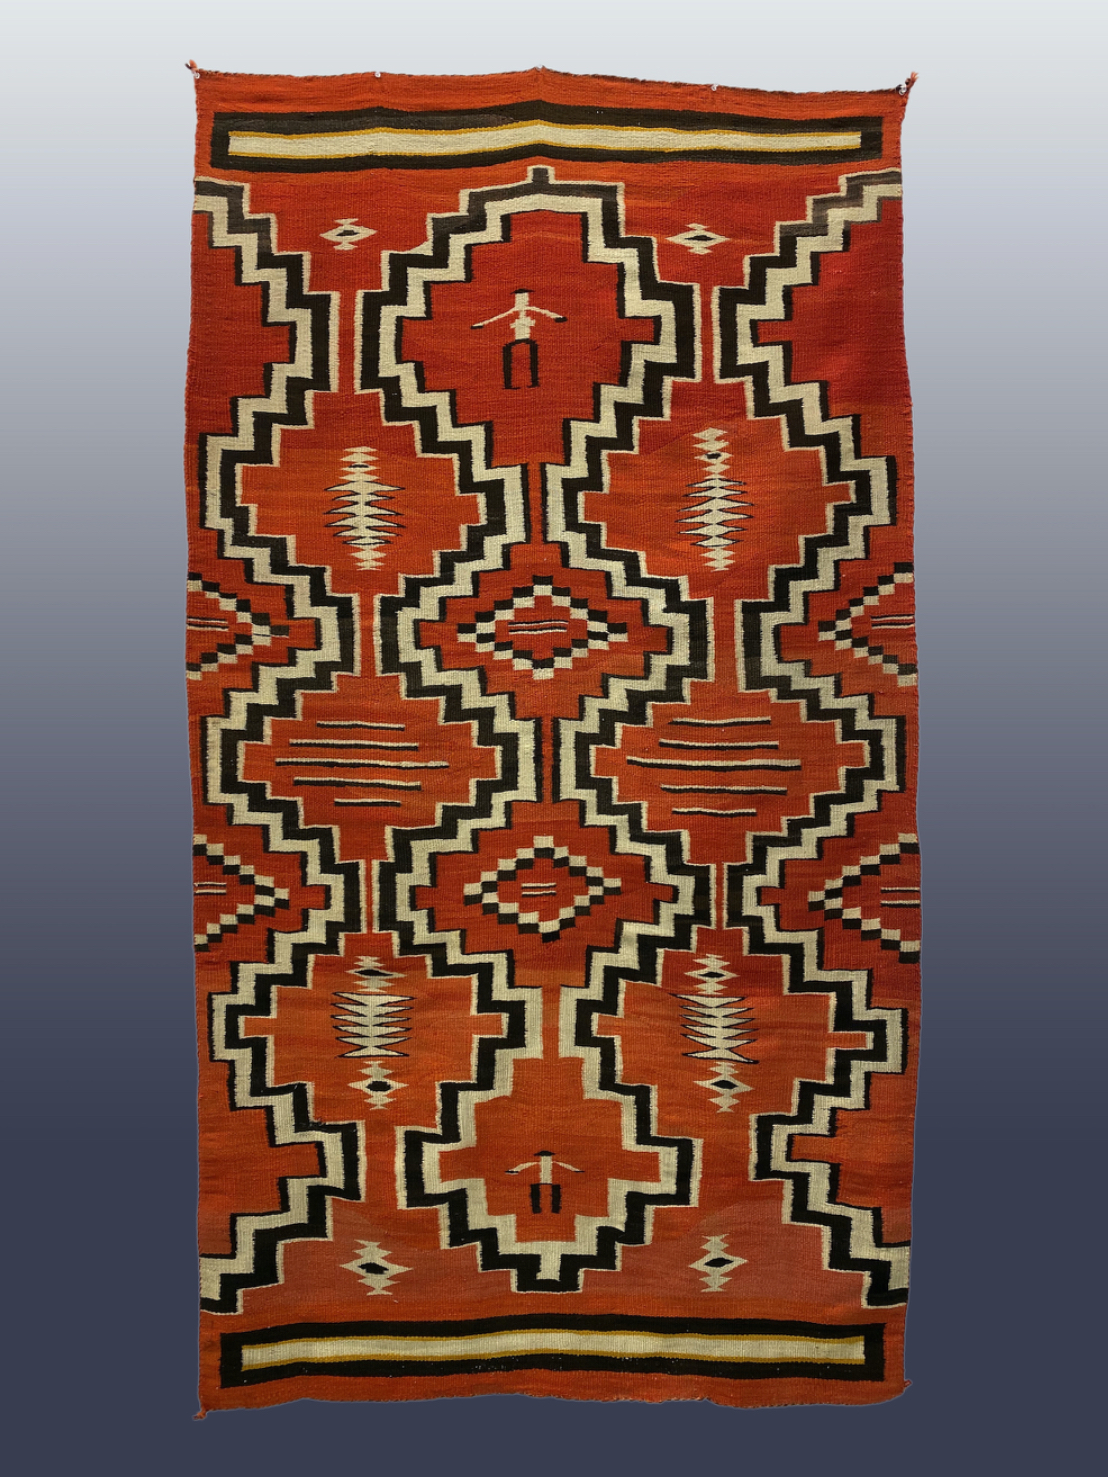 Navajo Pictorial Transitional Blanket